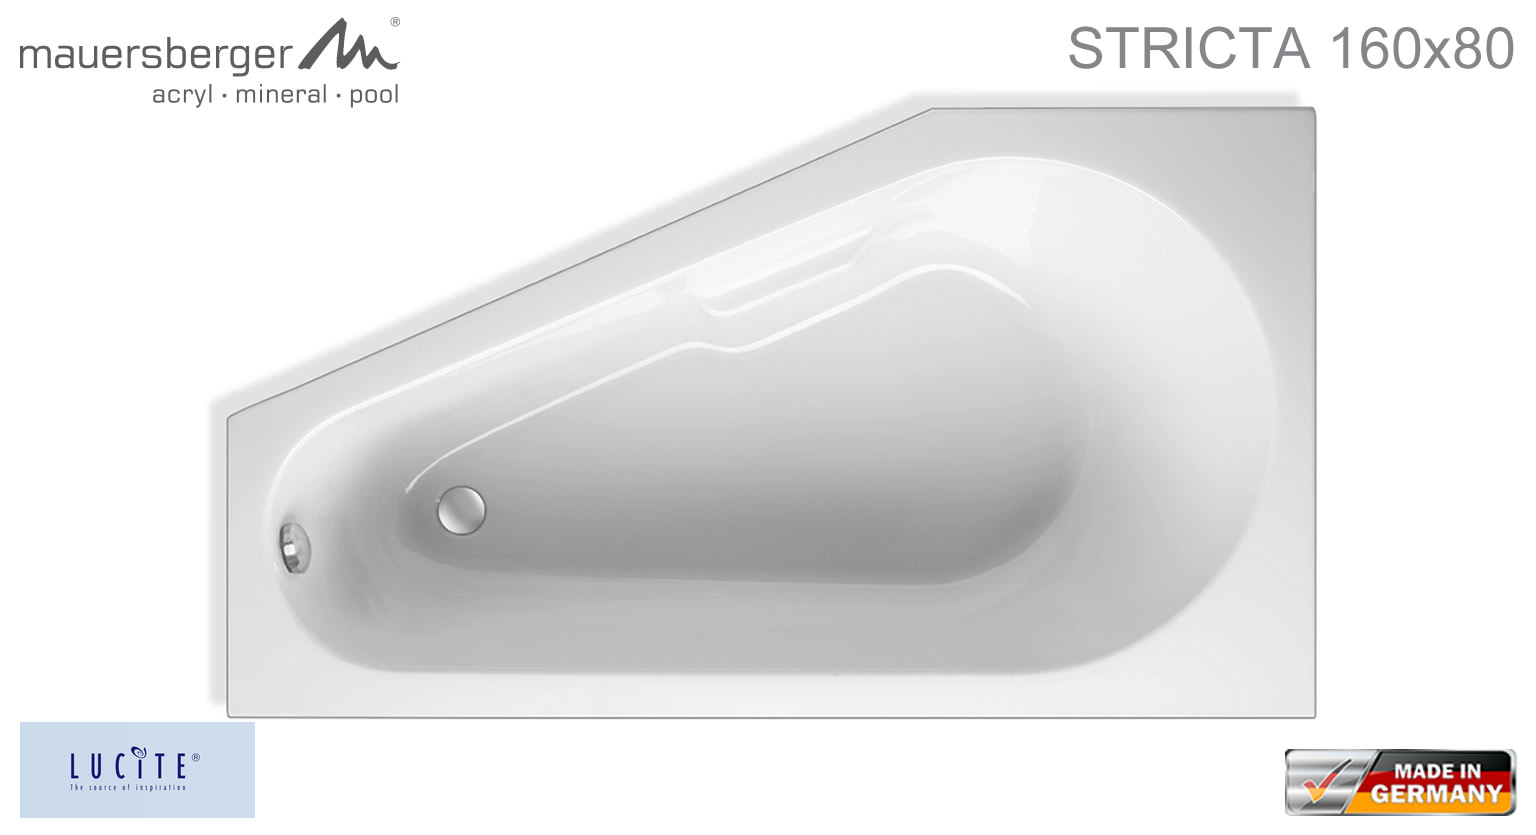 Gut gemocht Mauersberger Badewanne STRICTA 160 x 80 cm - ACRYL - Kompakt-Wanne GE82